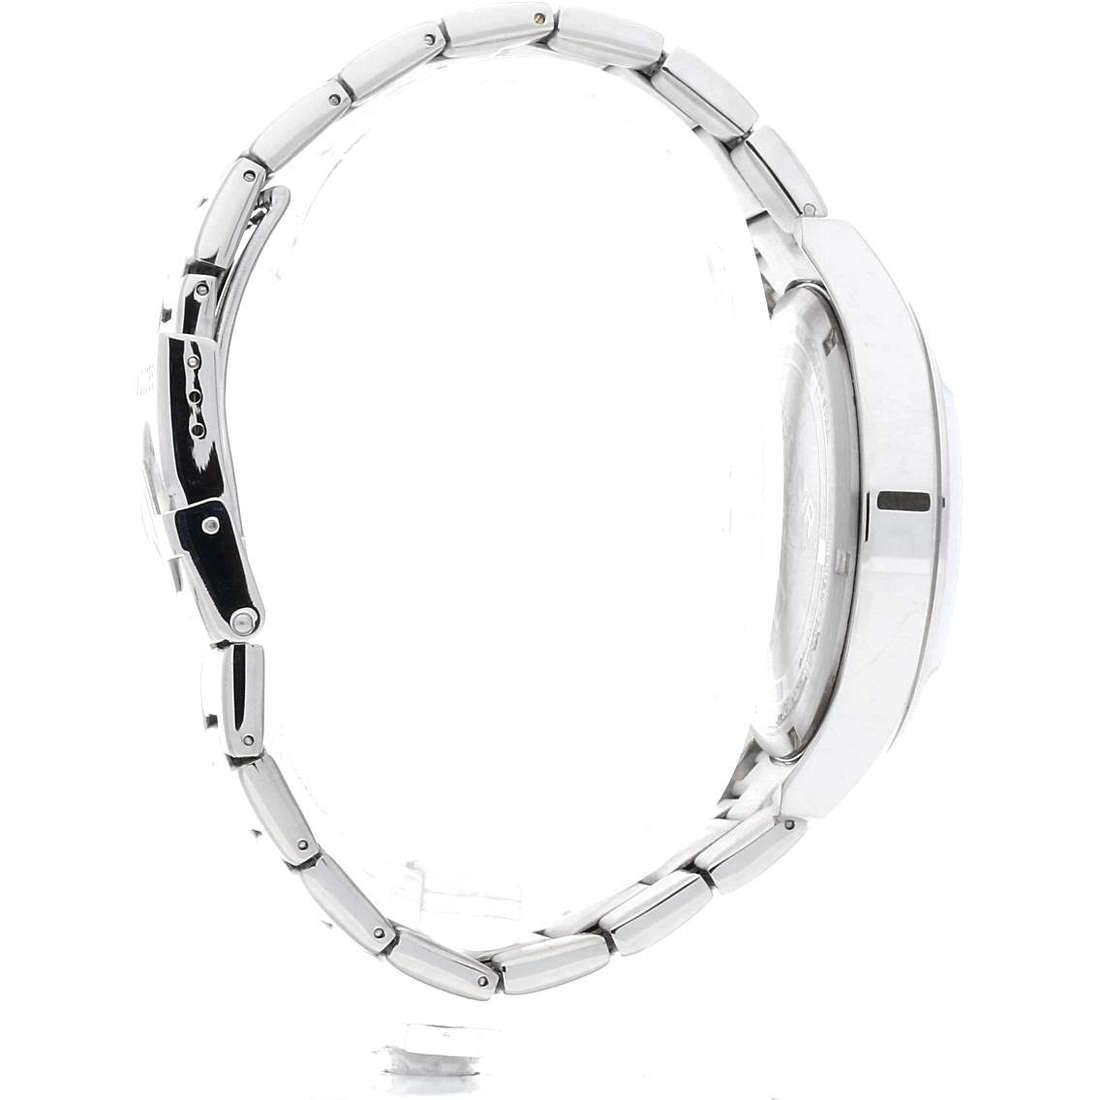 acquista orologi uomo Sector R3273690009